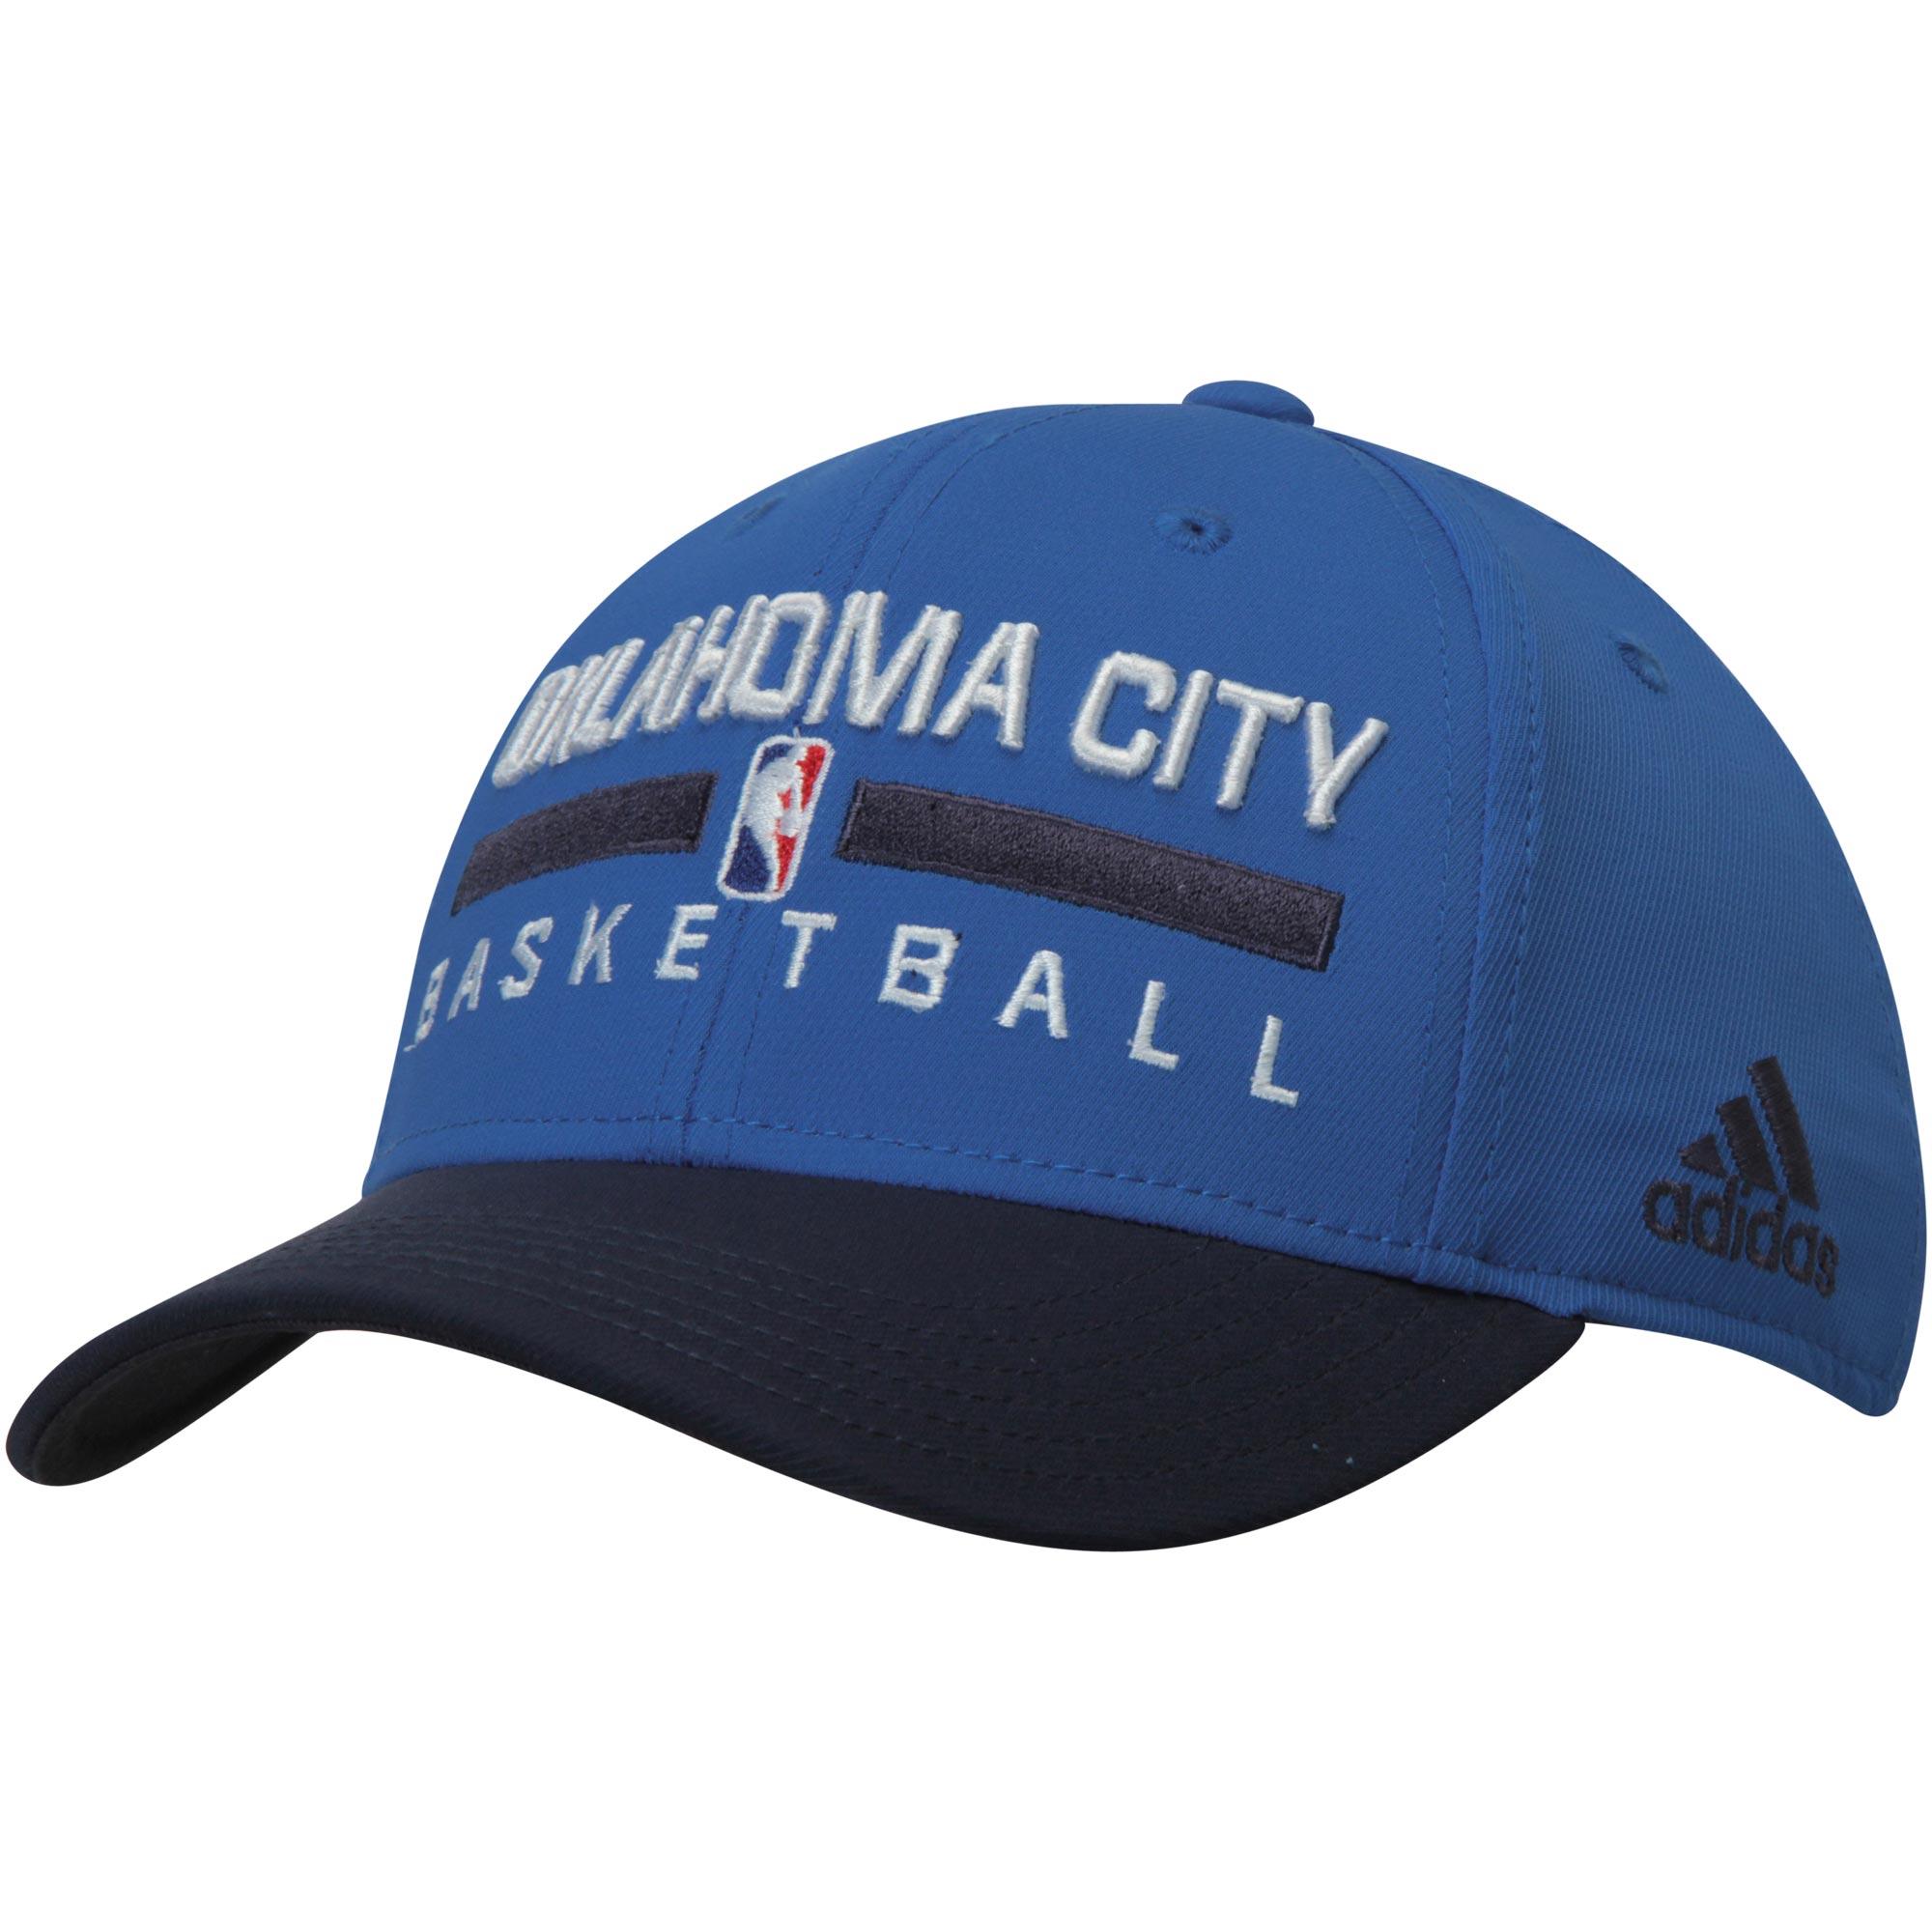 Oklahoma City Thunder adidas Youth Practice Adjustable Hat - Blue/Navy